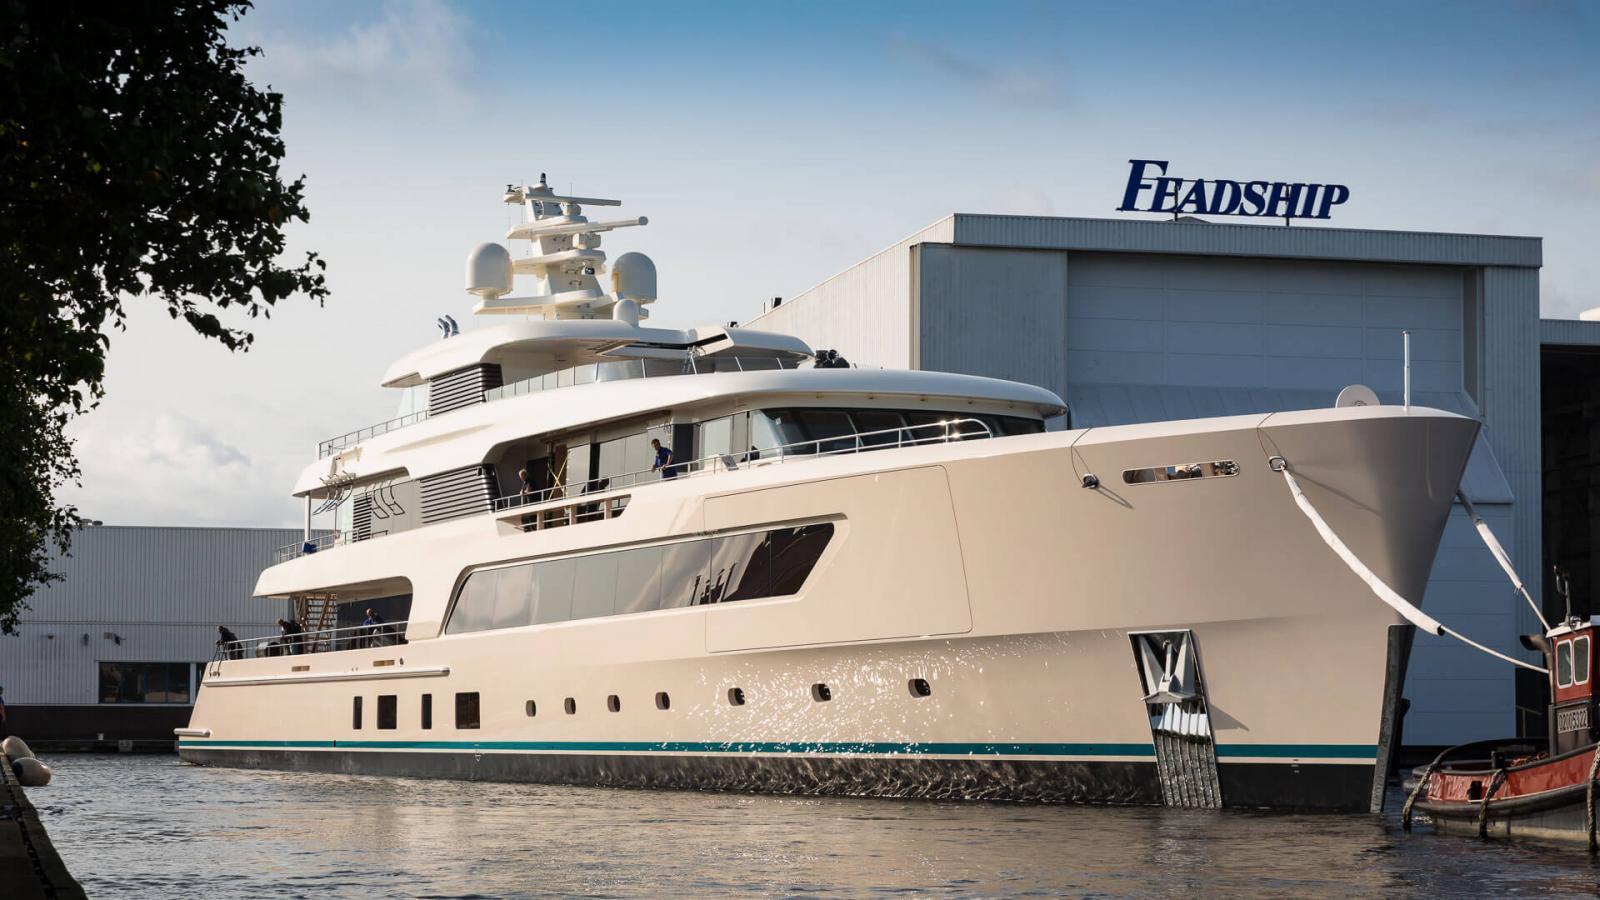 Feadship Hull 696 Superyacht